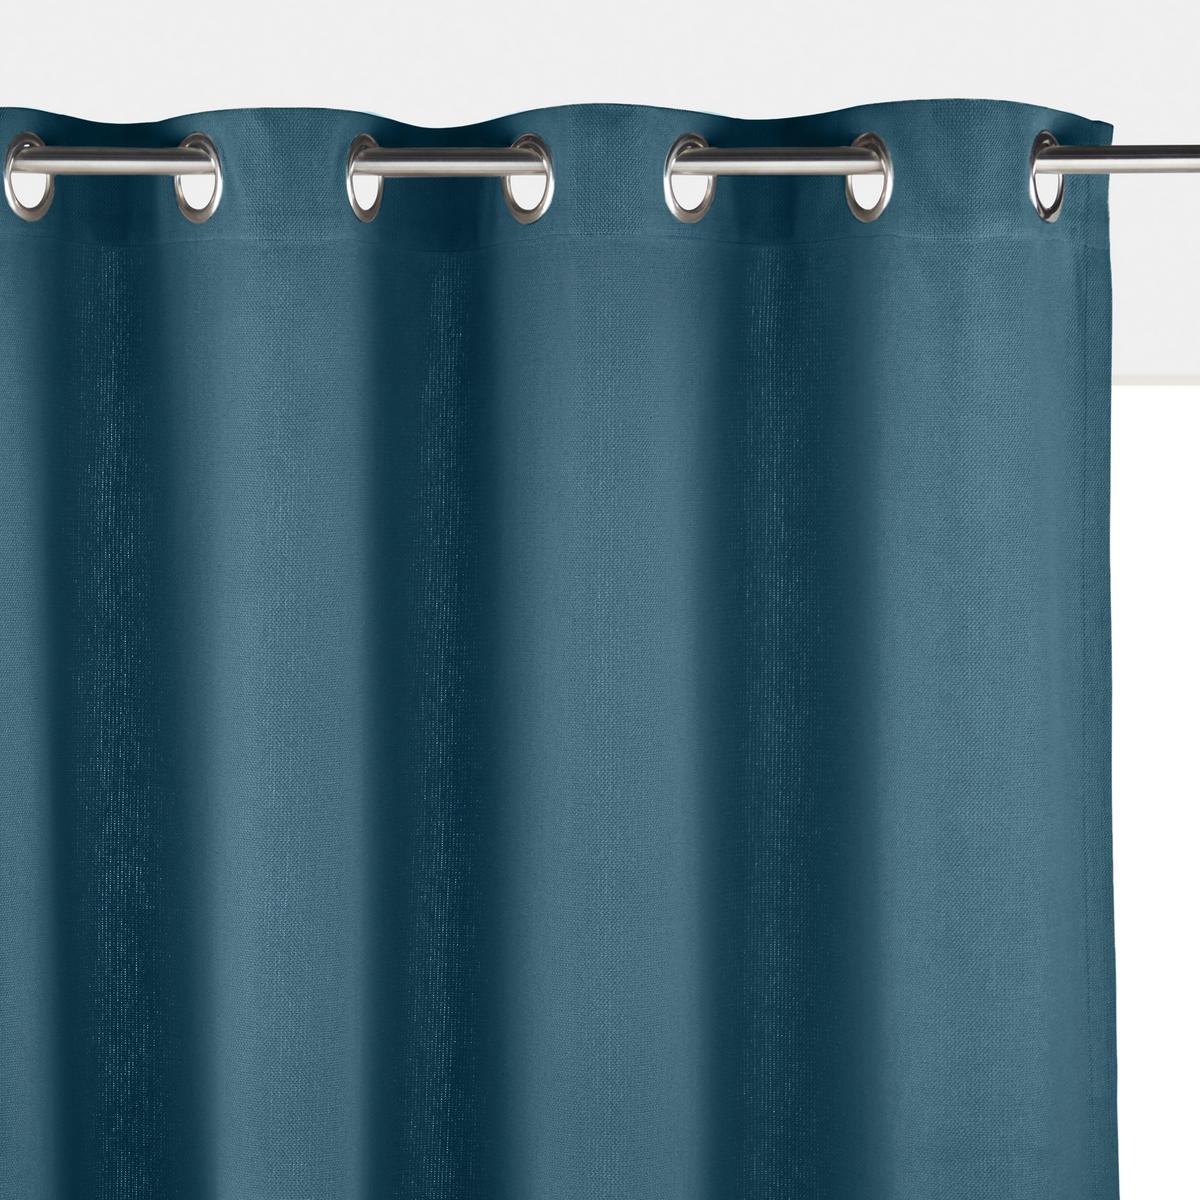 Штора La Redoute Однотонная из плетеного хлопка PANAMA 350 x 140 см синий